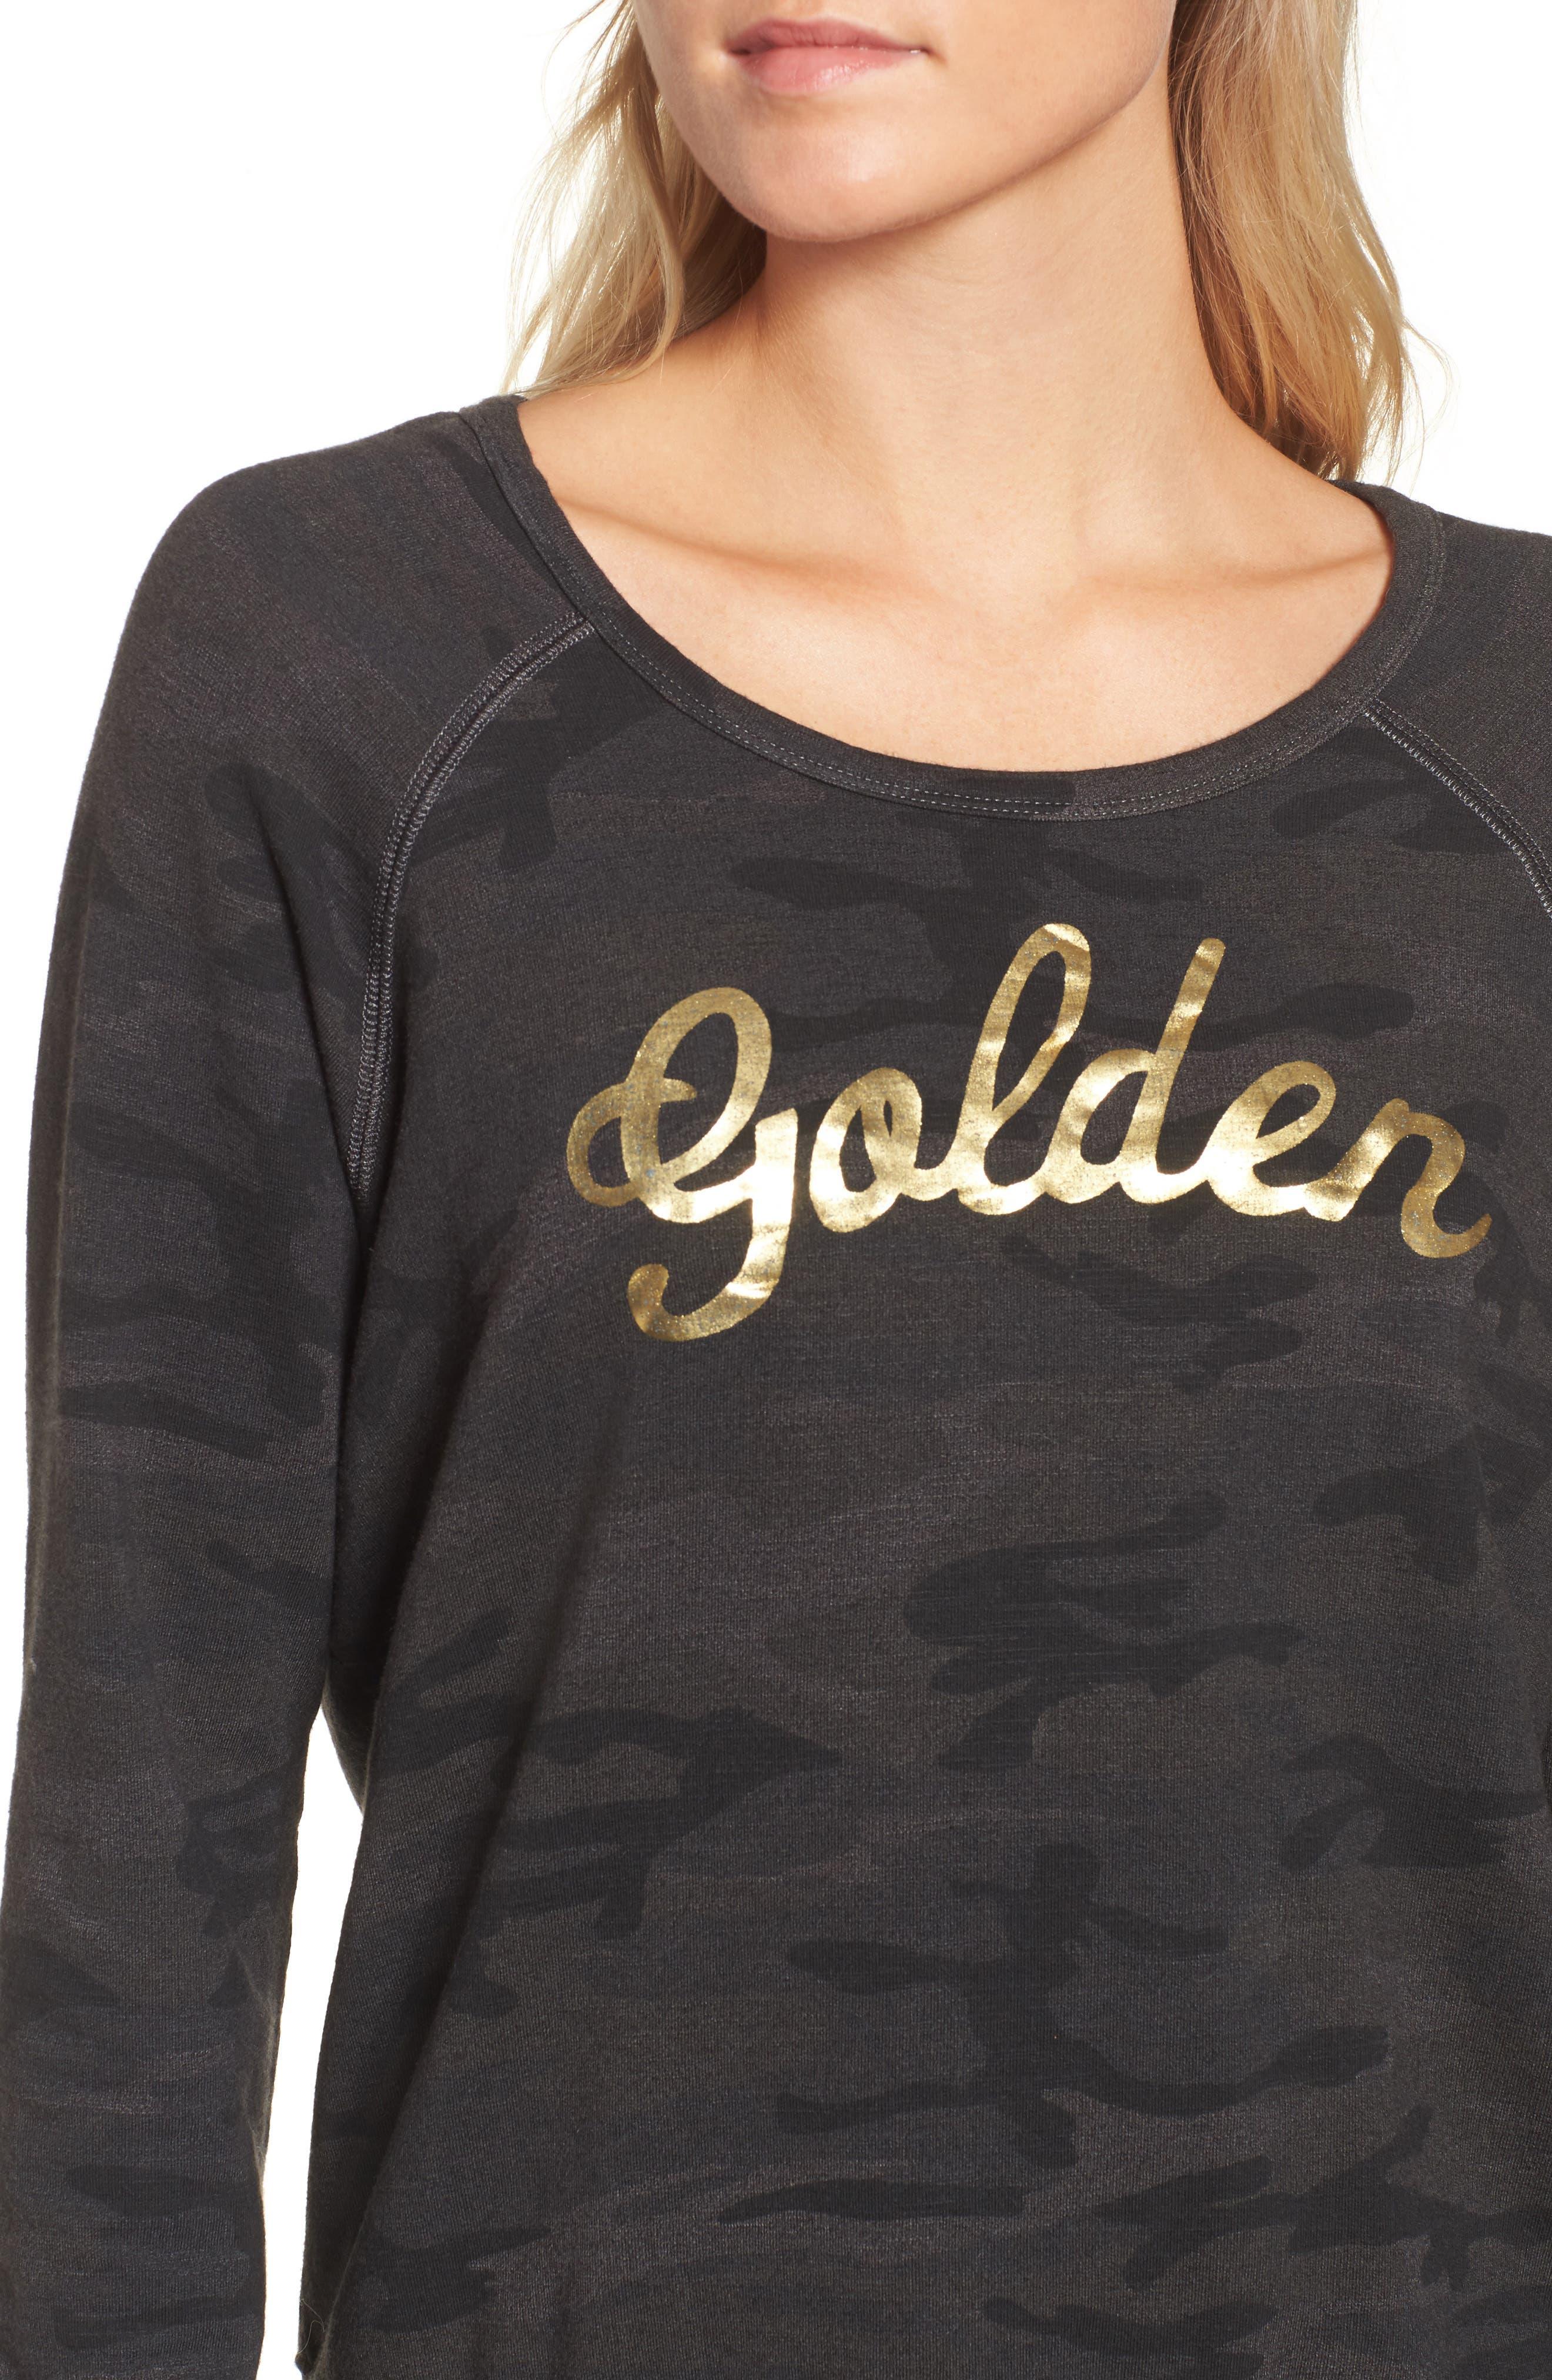 Active Golden Sweatshirt,                             Alternate thumbnail 4, color,                             Charcoal